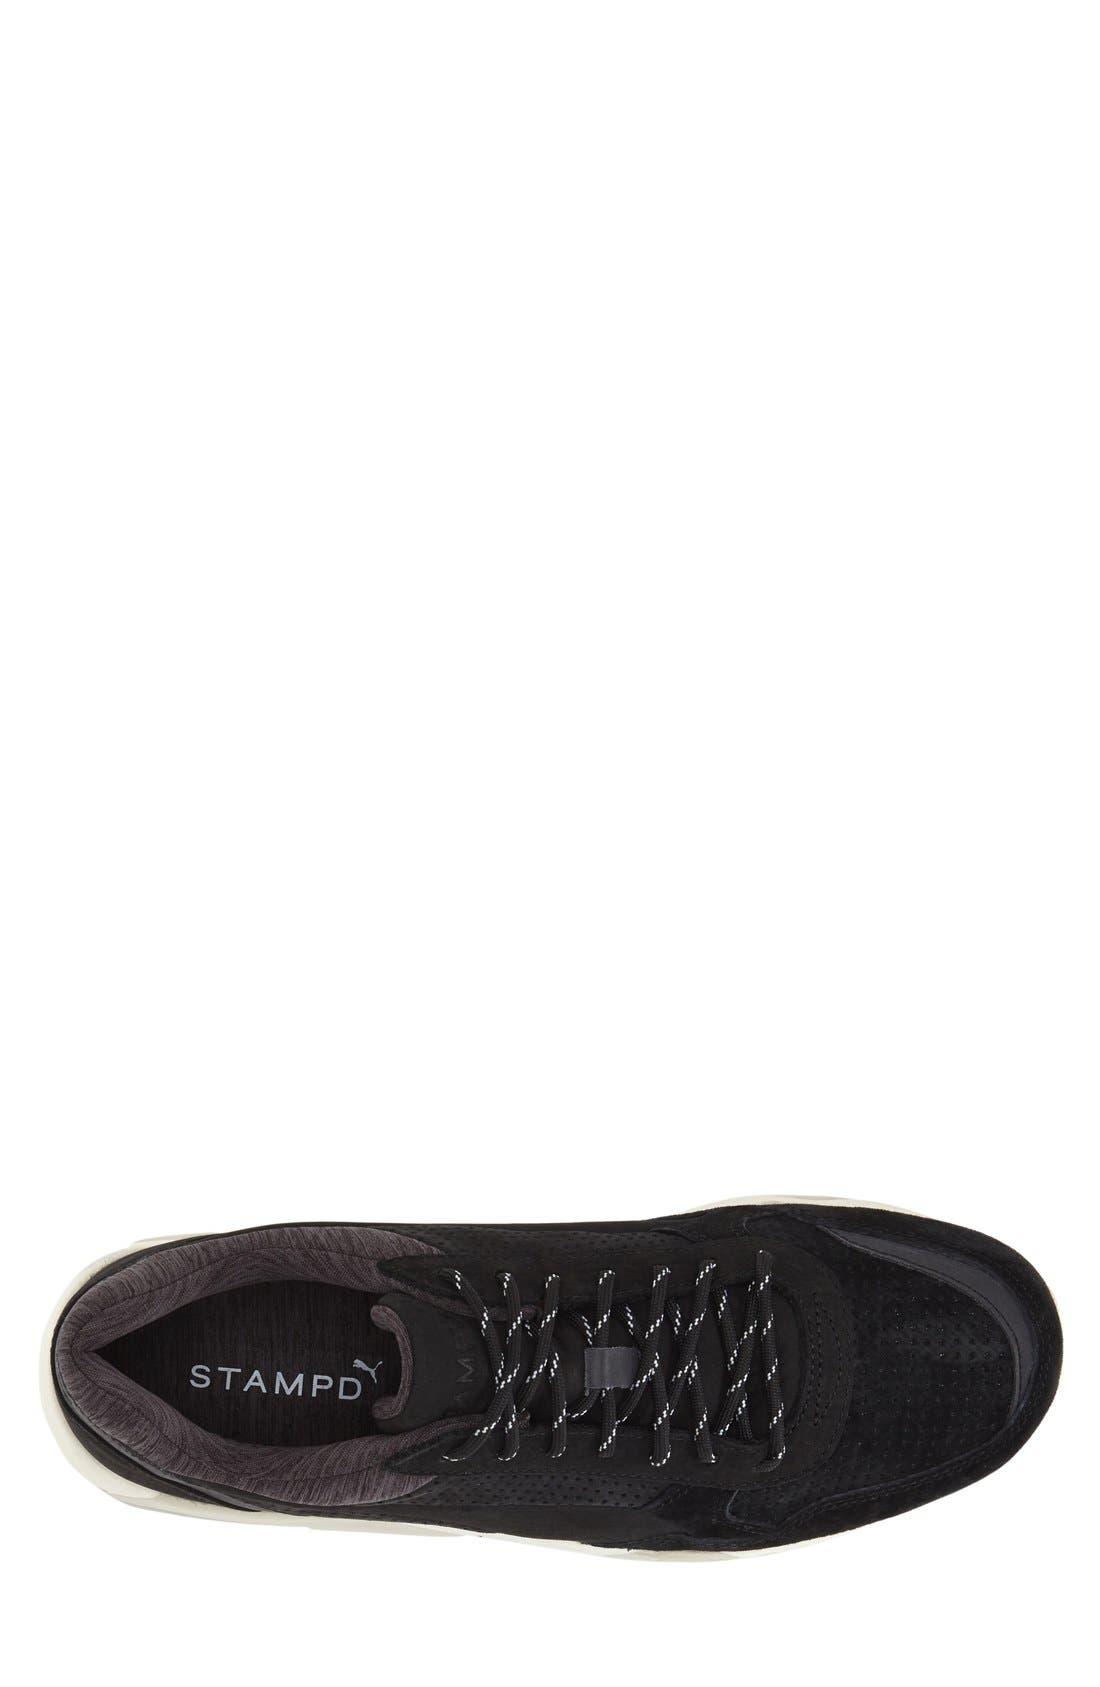 'R698 X STAMPD' Sneaker,                             Alternate thumbnail 2, color,                             001